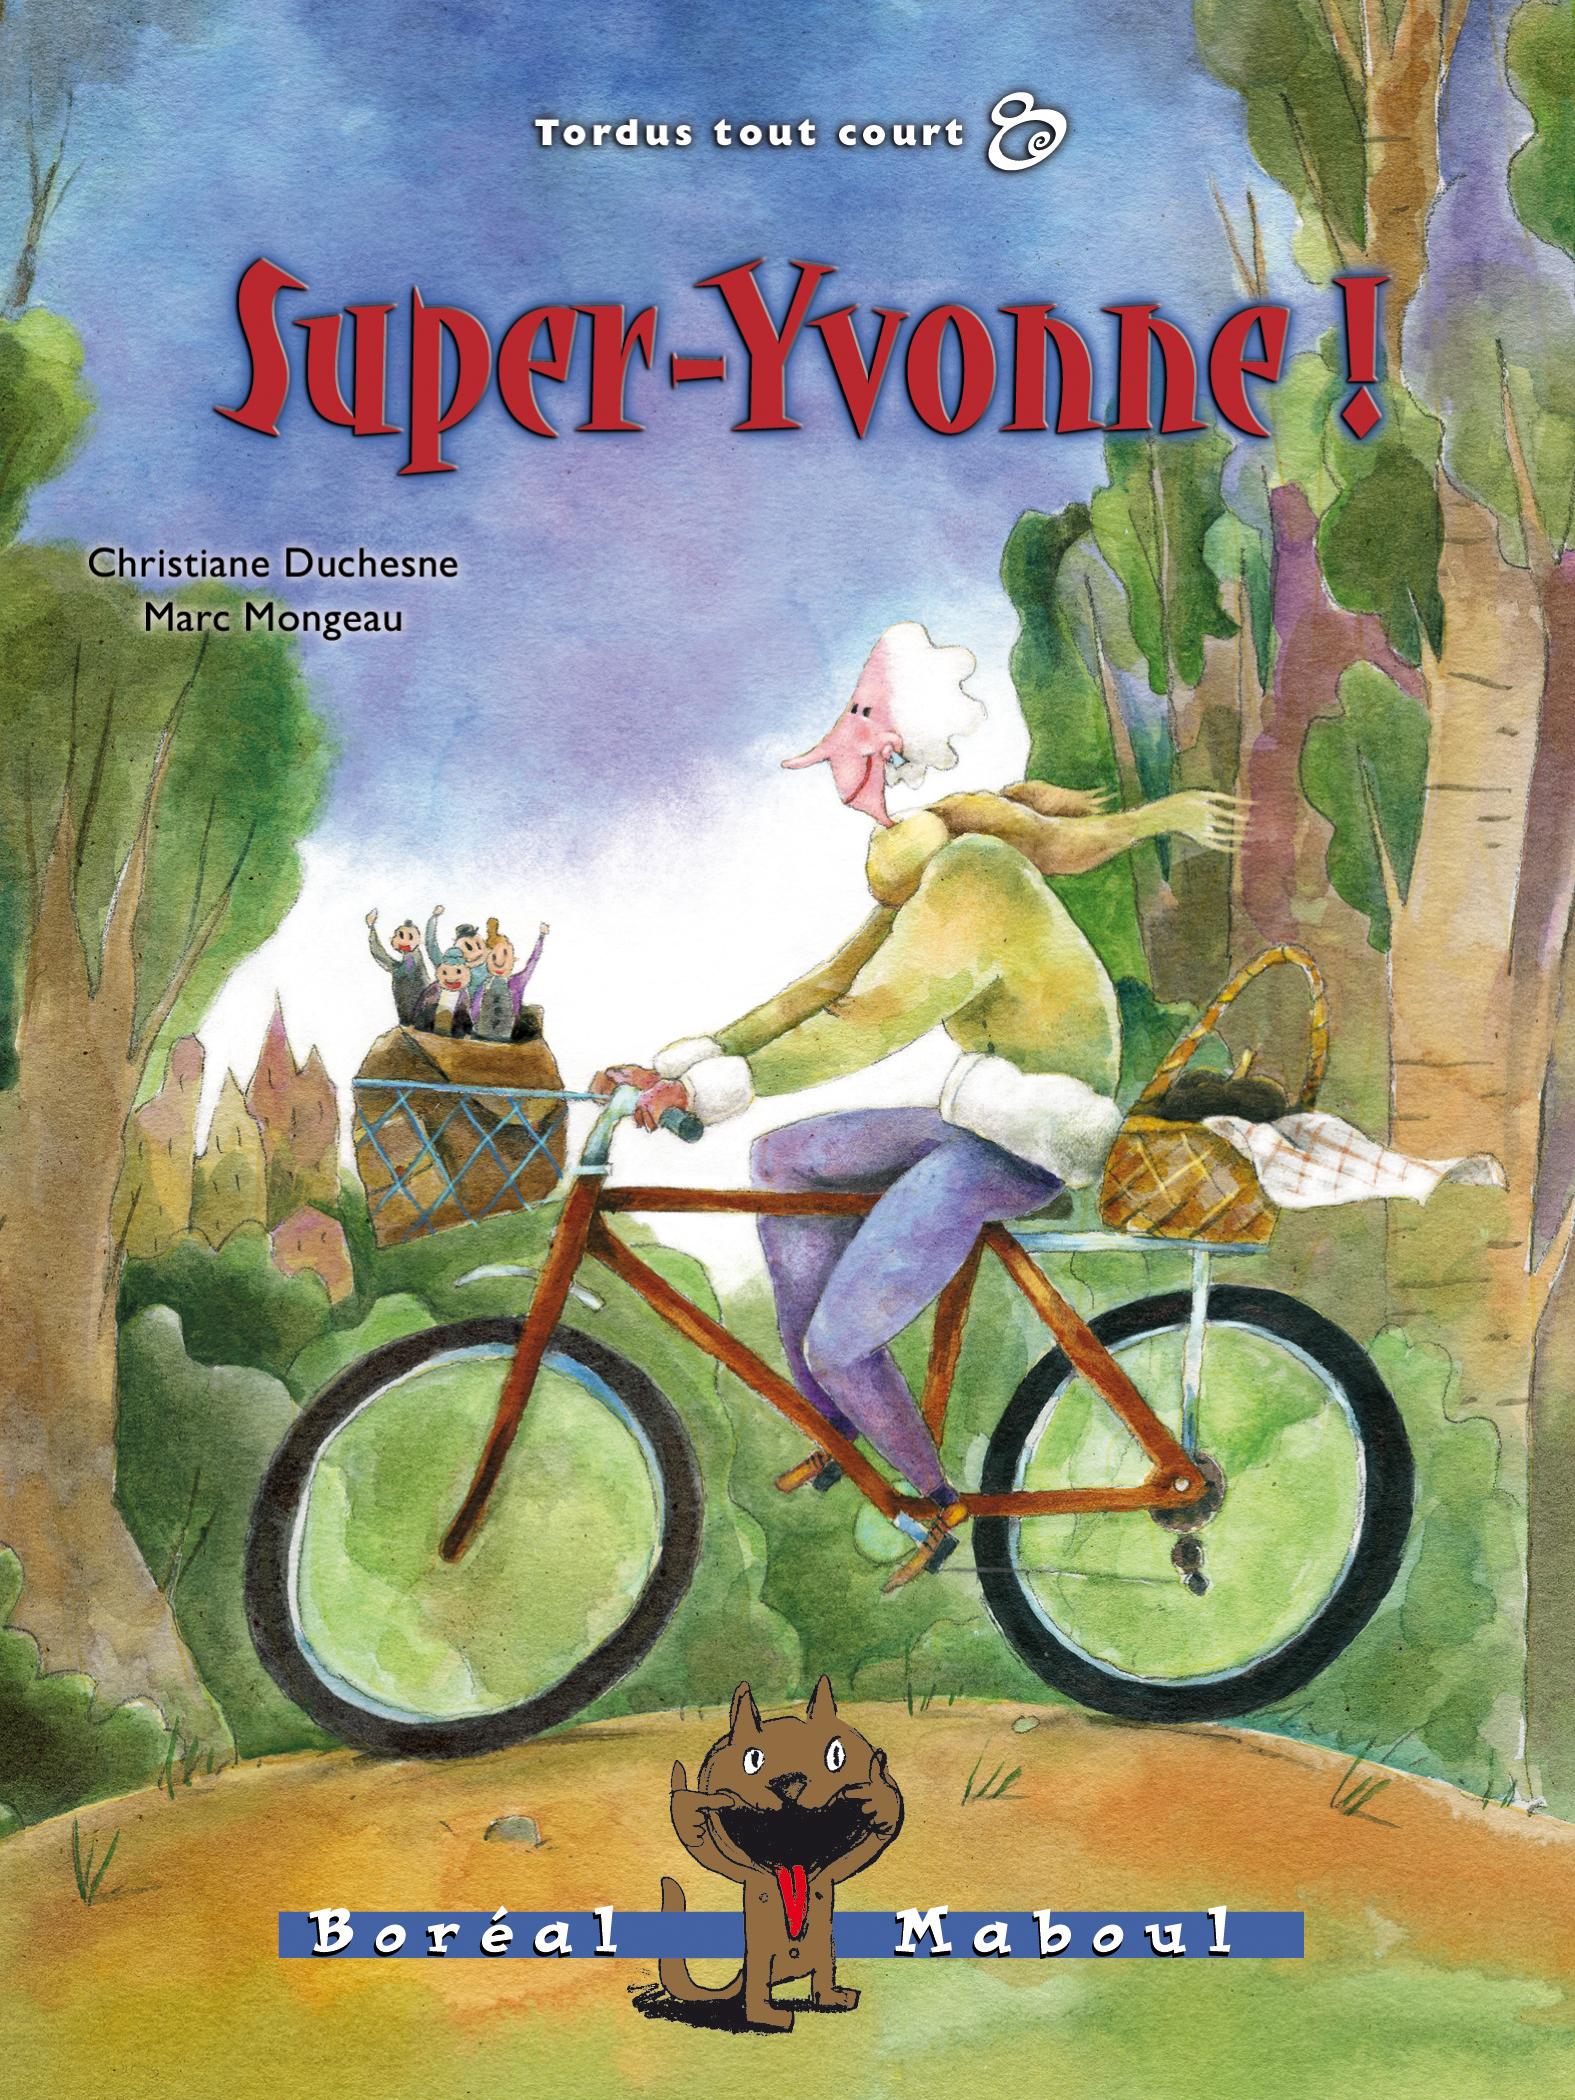 Super-Yvonne !